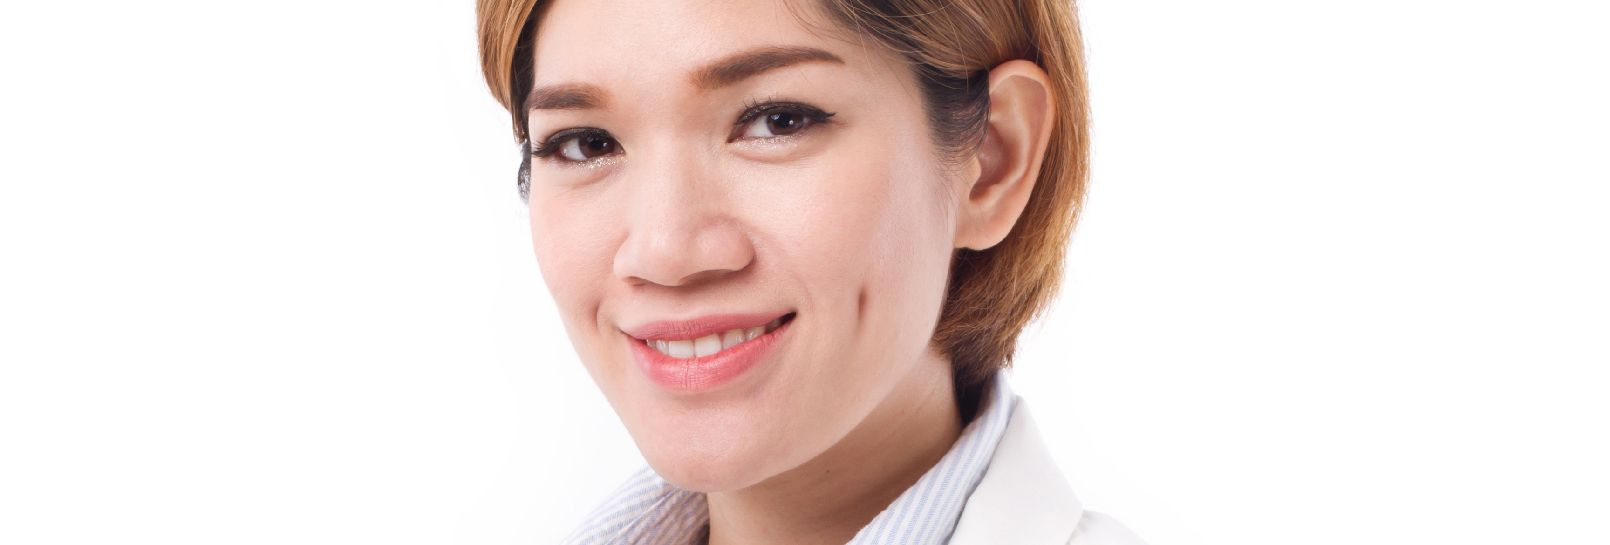 ERP-Anwendungsbetreuer / Systemadministrator (m/w/d)